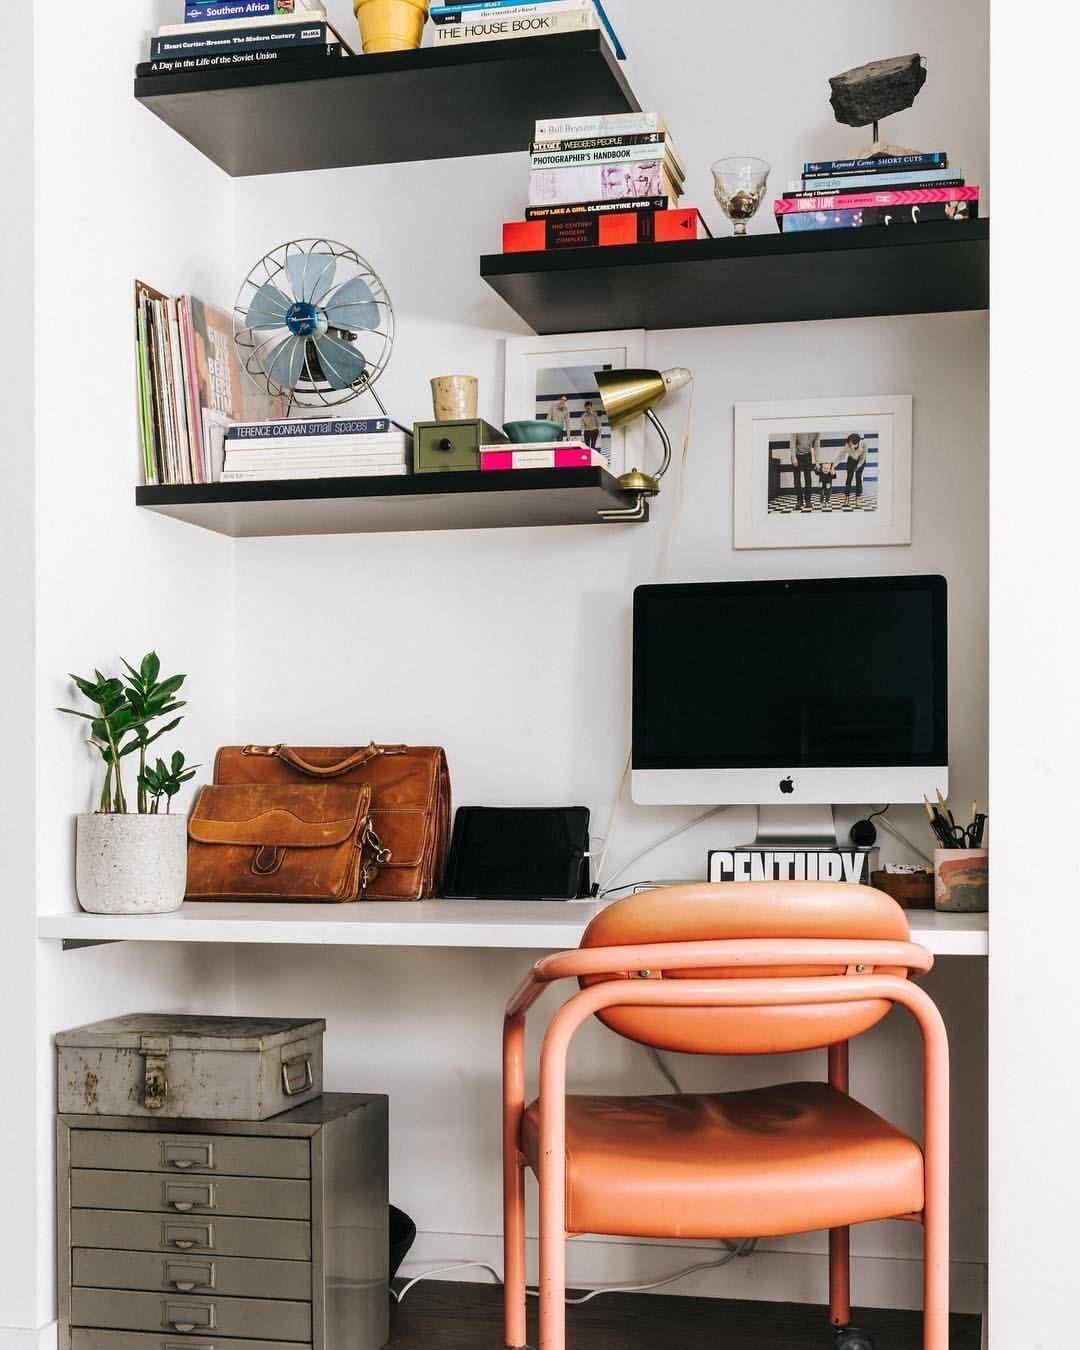 apartmenttherapy on Instagram homedecor interiordesign